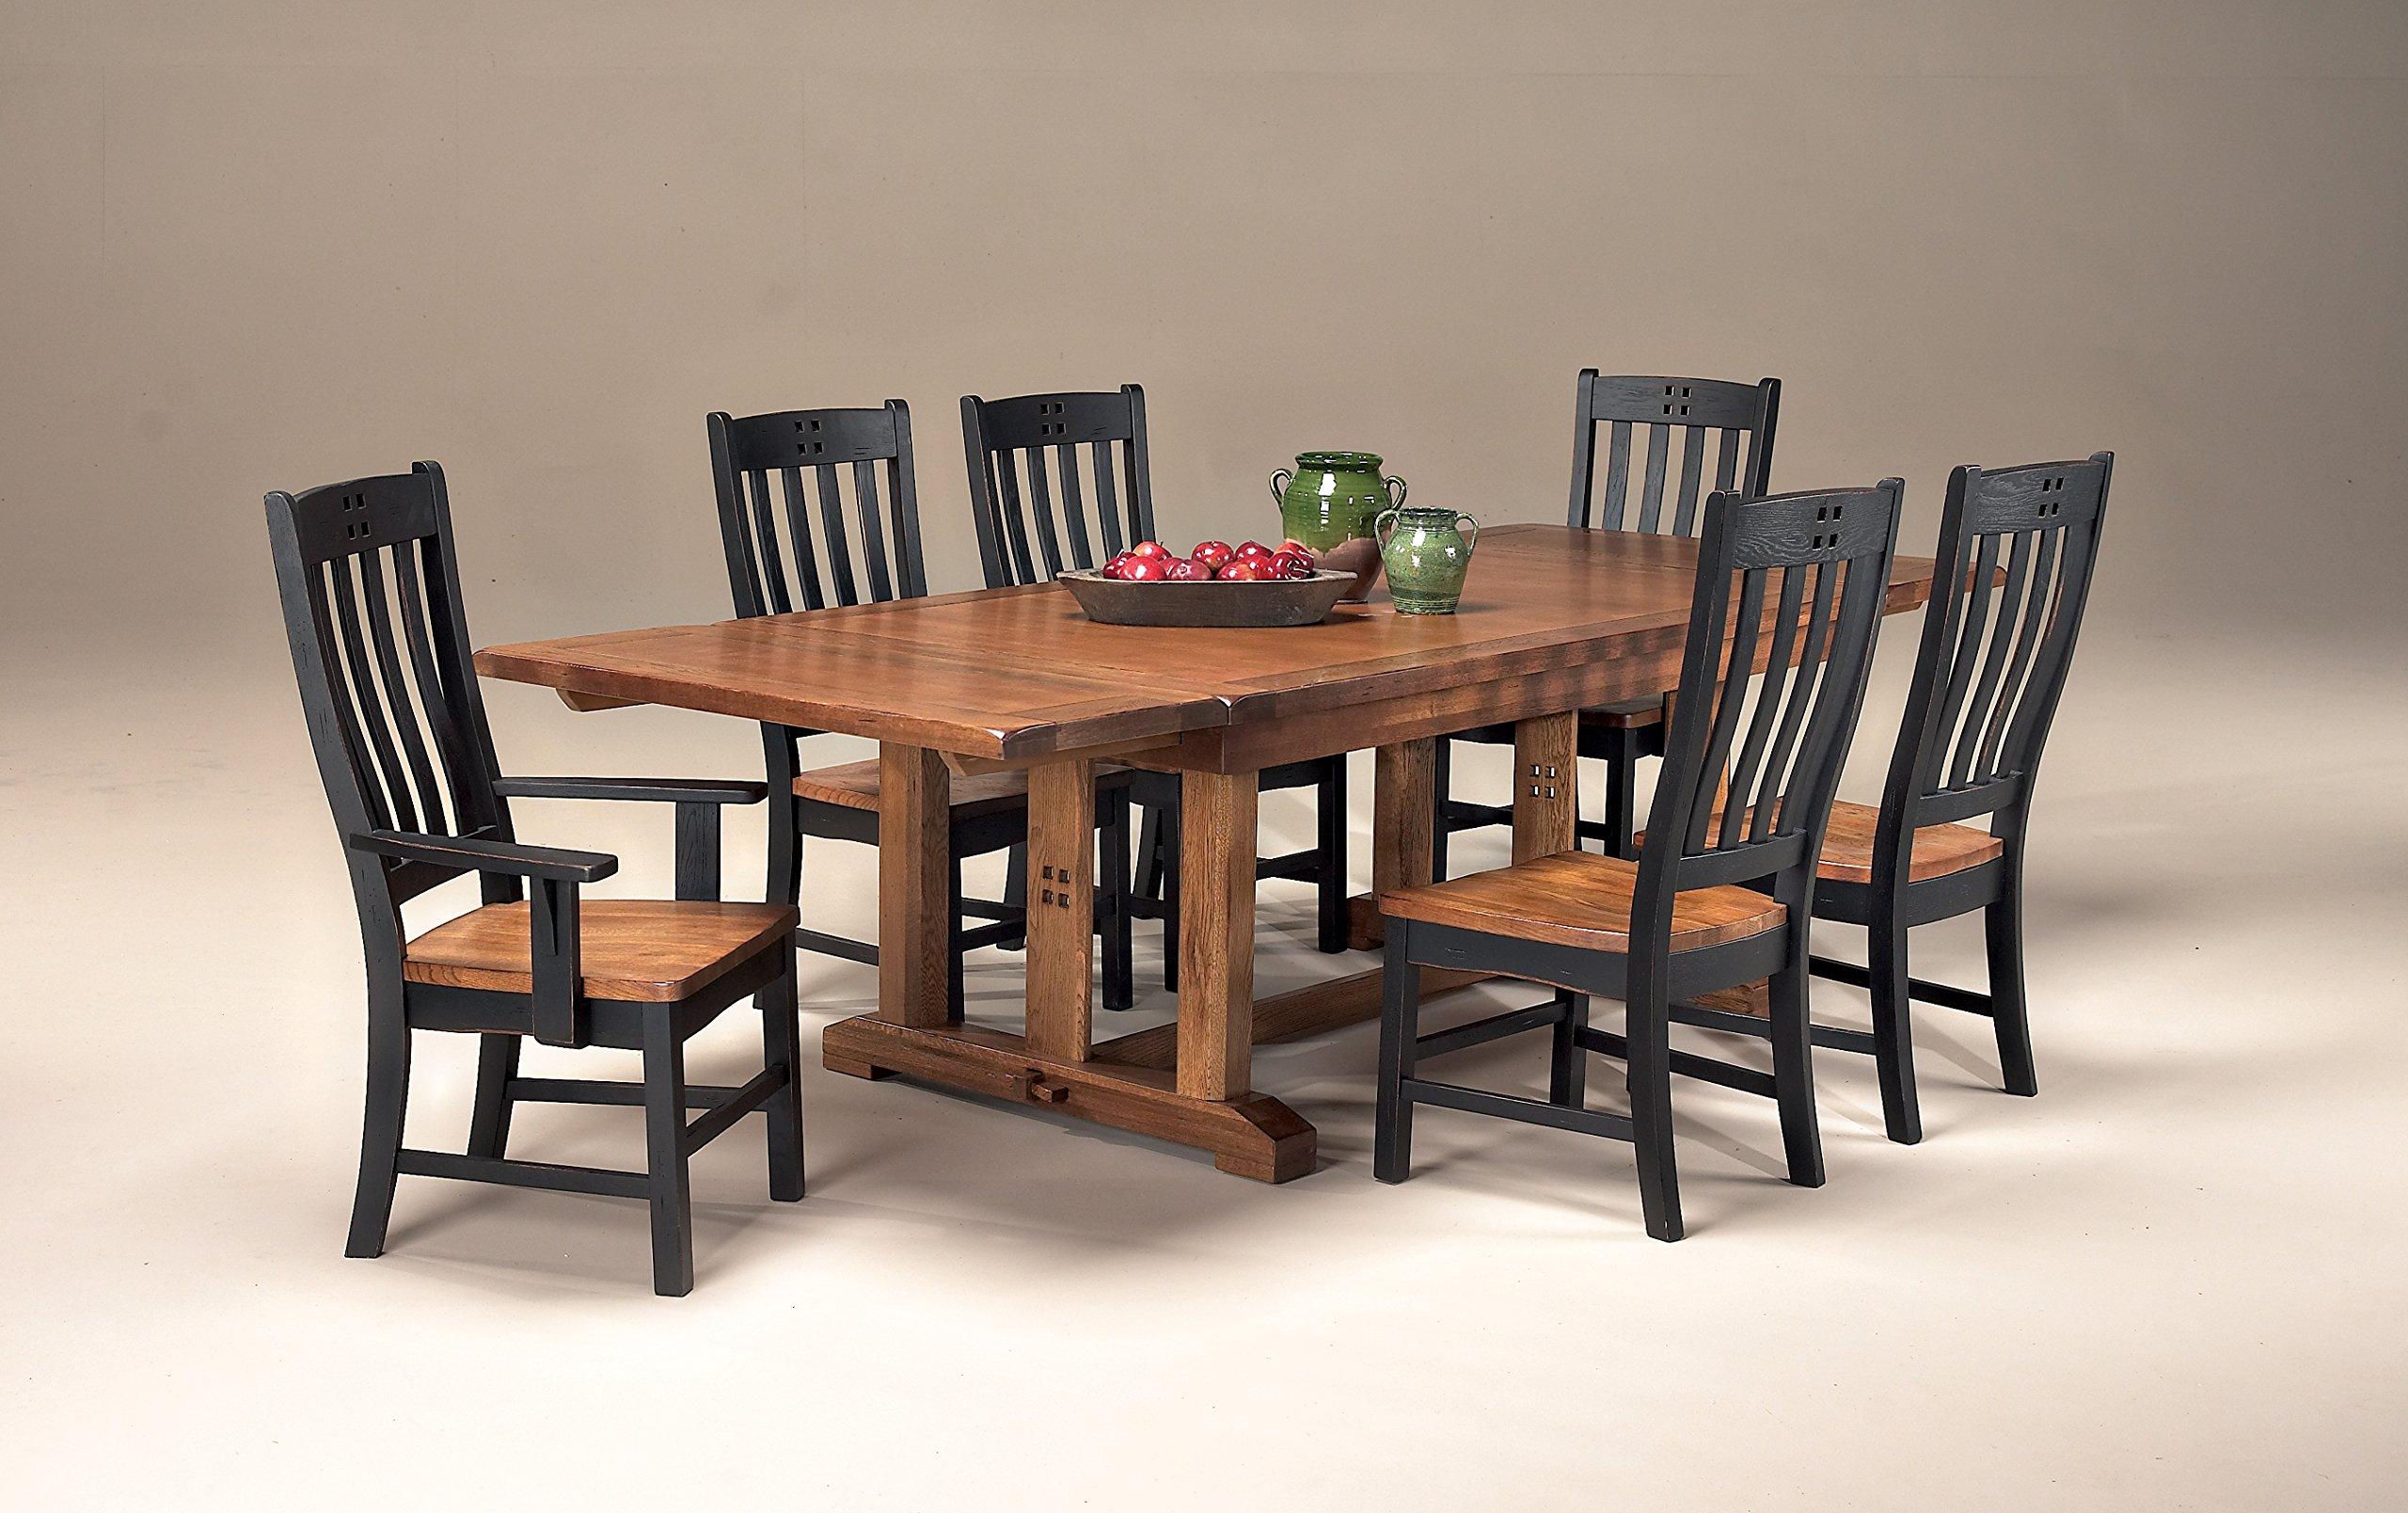 Kitchen & Dining Room Furniture -  -  - 81VtO7xvIAL -